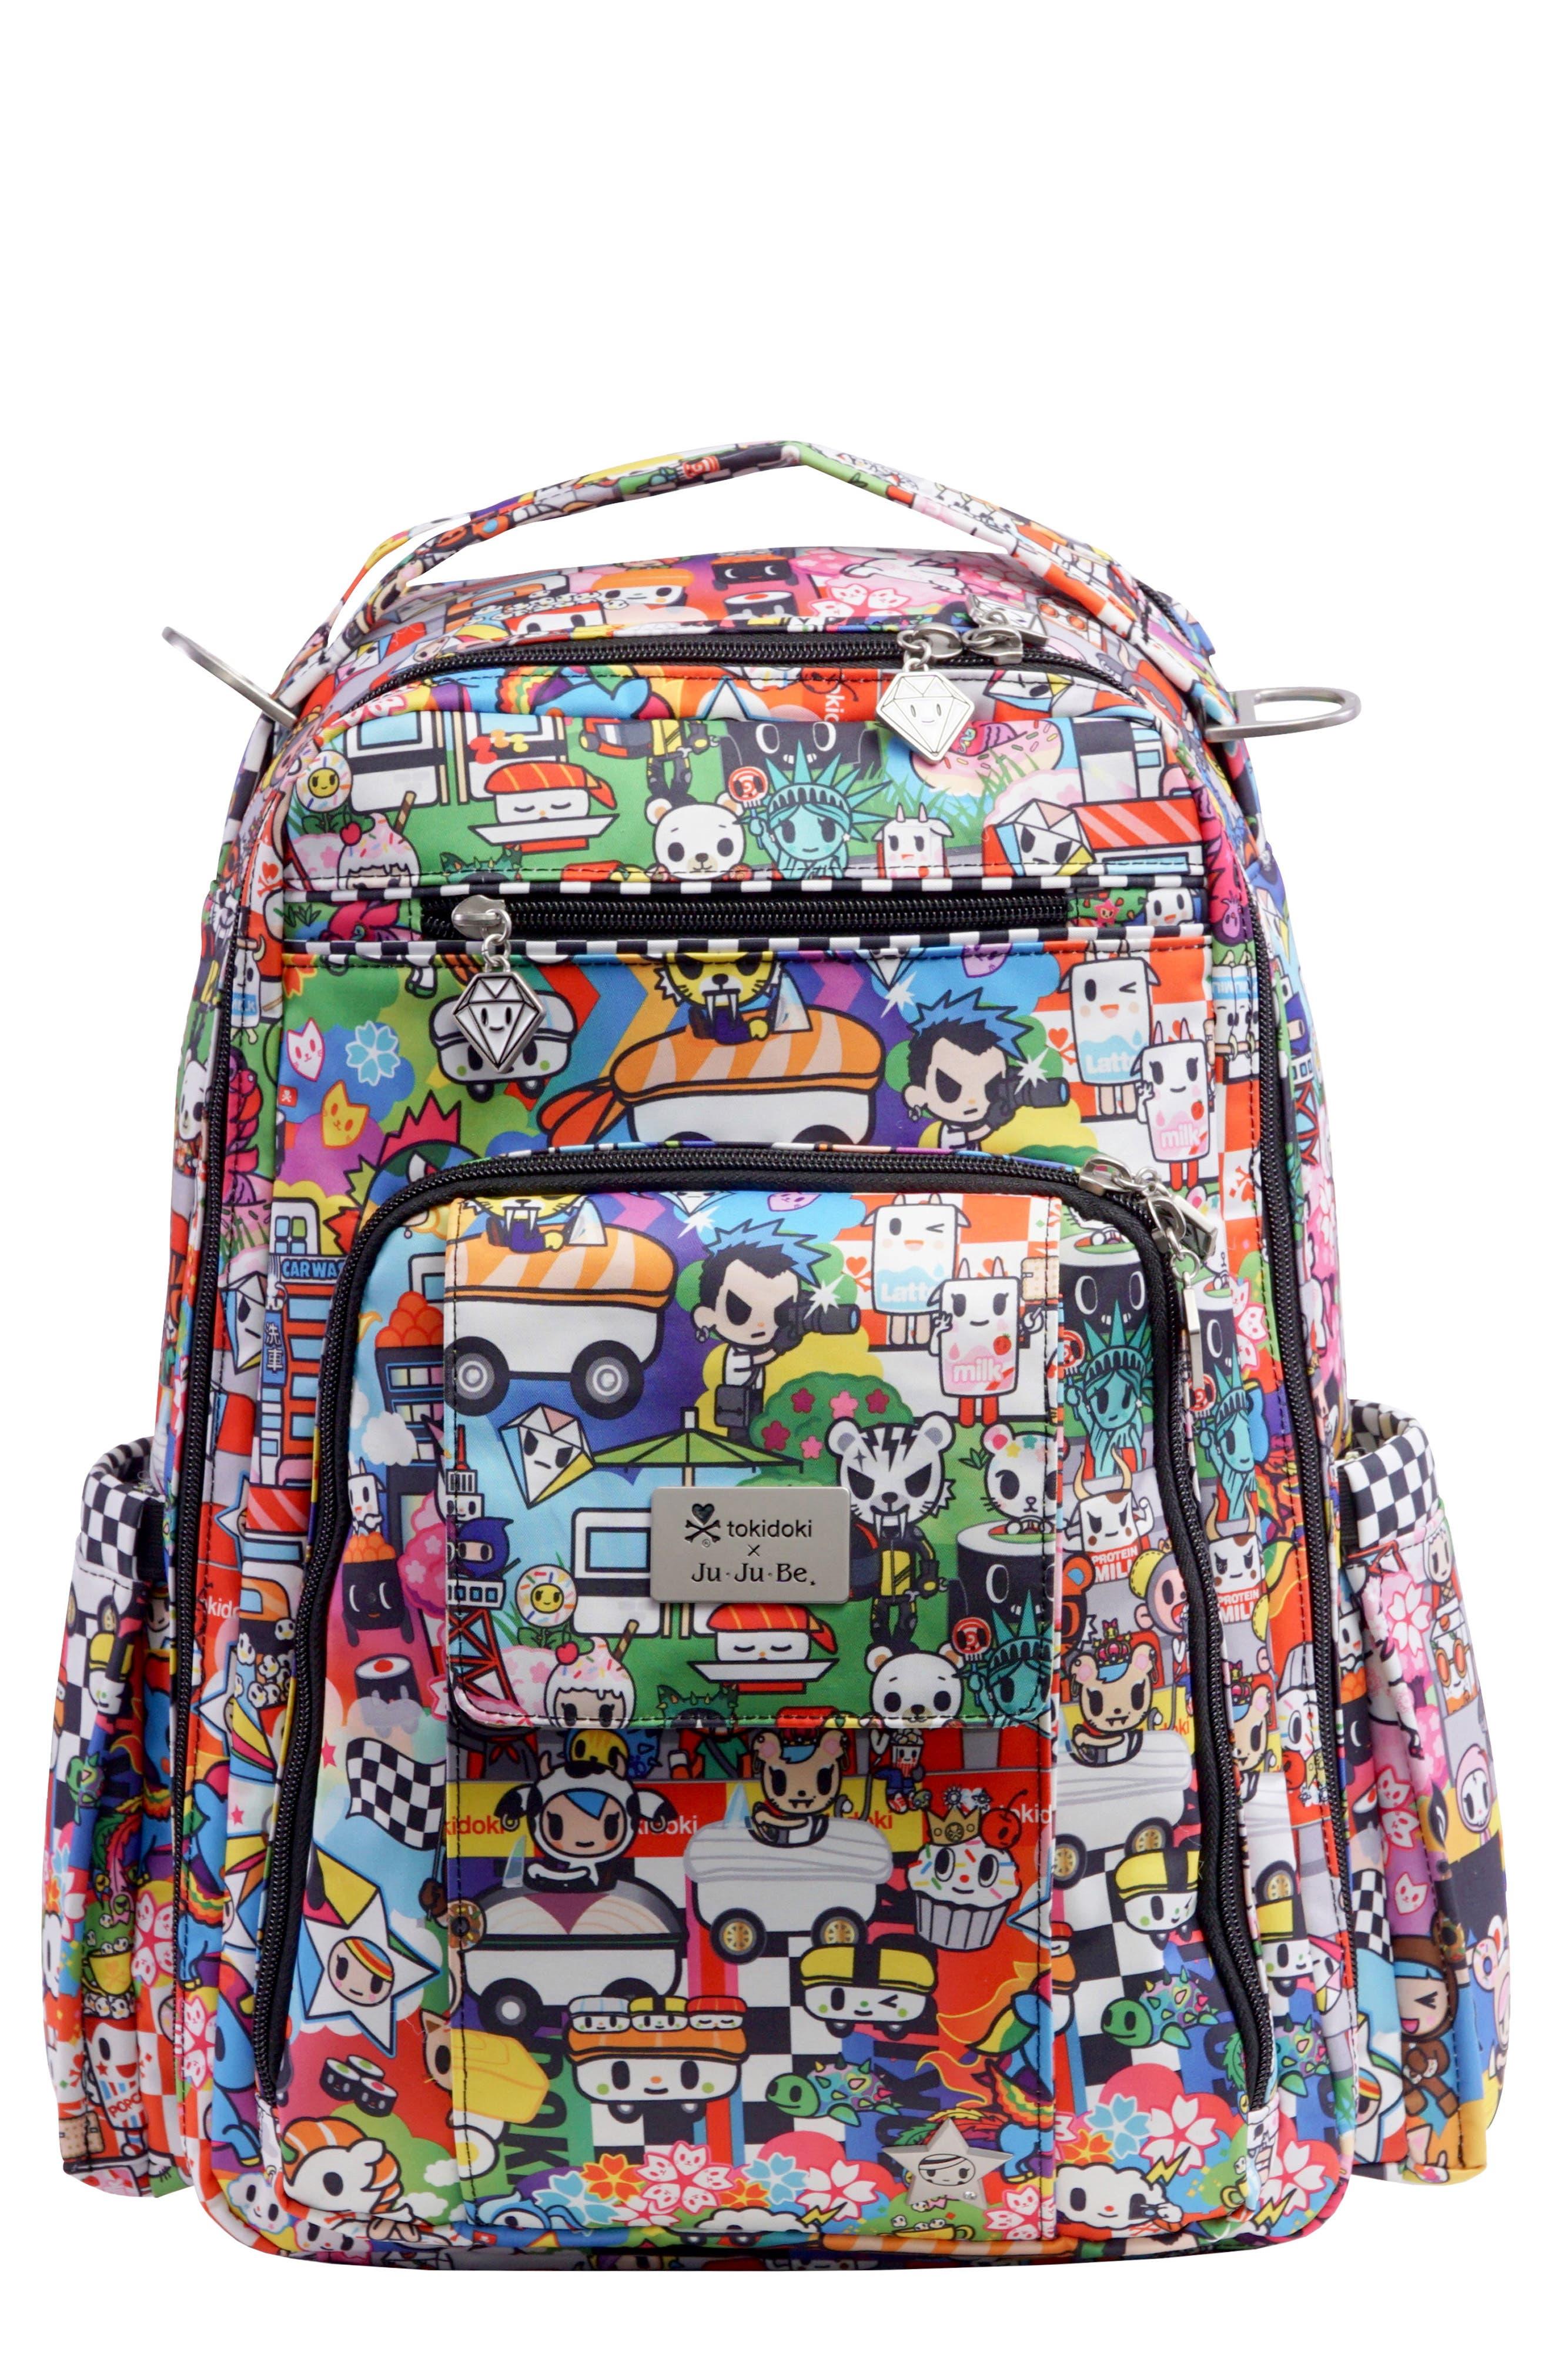 tokidoki x Ju-Ju-Be 'Be Right Back' Diaper Backpack,                         Main,                         color, SUSHI CARS